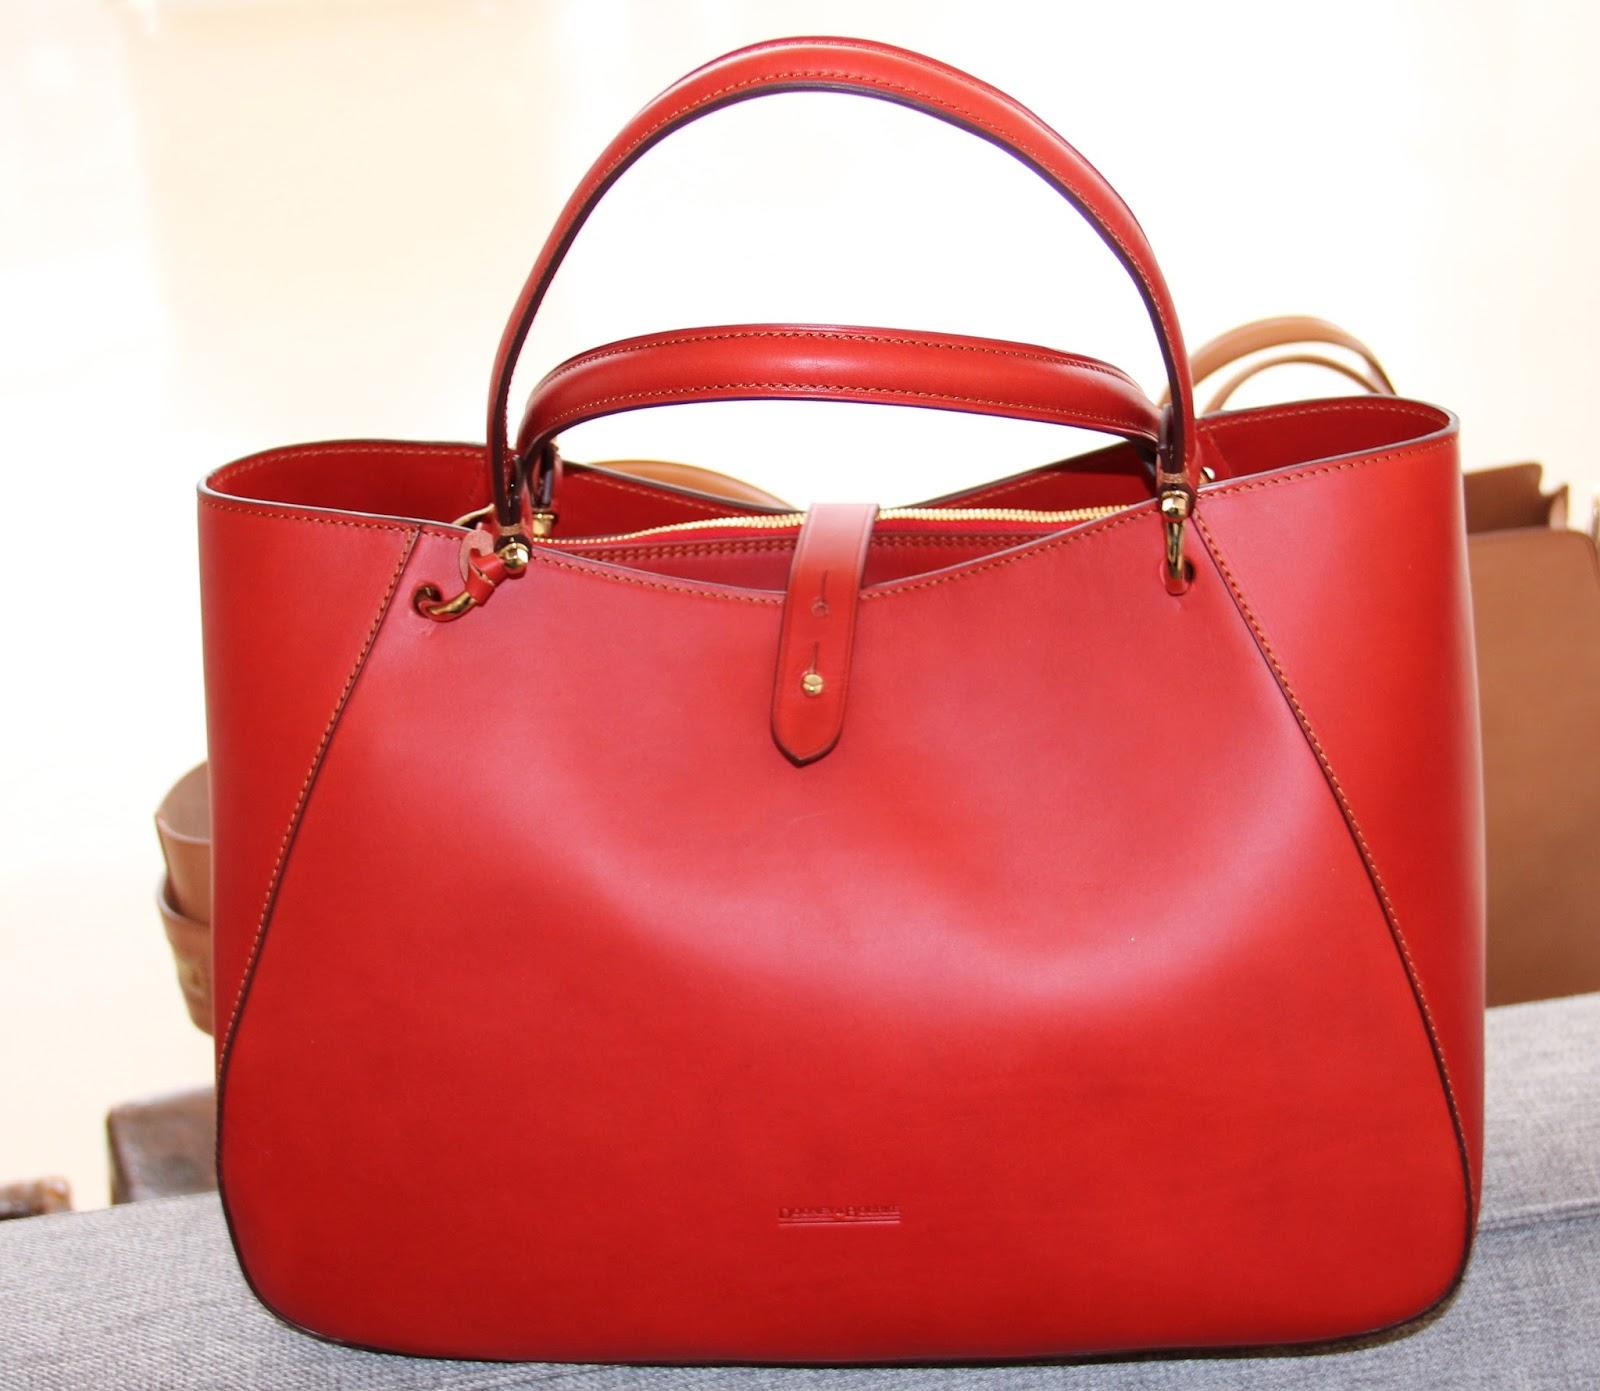 4c37af5b559 Dooney & Bourke Spring 2014 Satchels, Handbags, Totes, Accessories ...